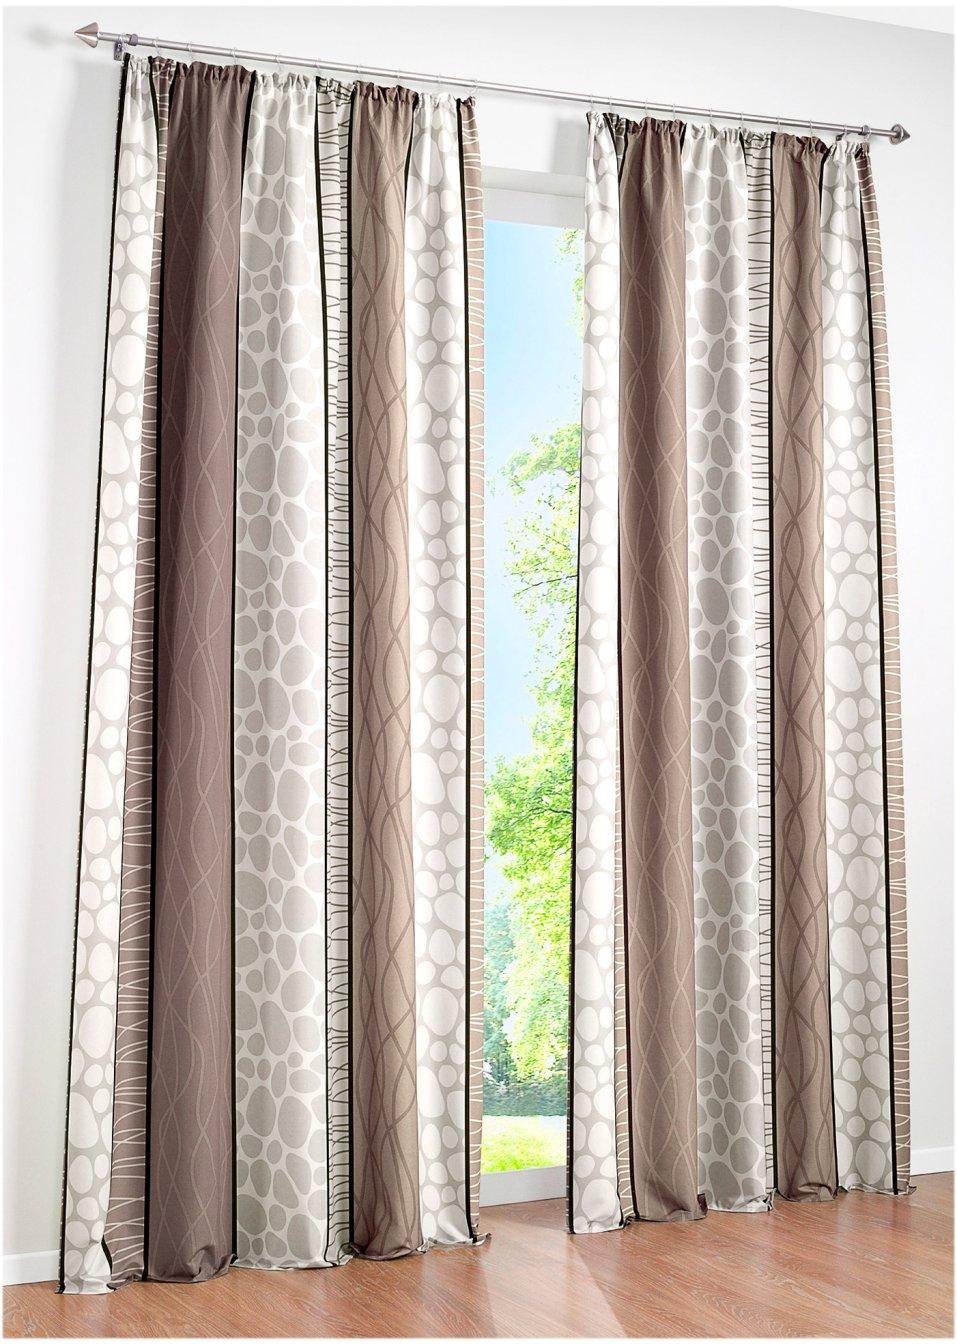 sch nes und zeitloses design mit dem bedruckten vorhang estelle taupe kr uselband 1er pack. Black Bedroom Furniture Sets. Home Design Ideas